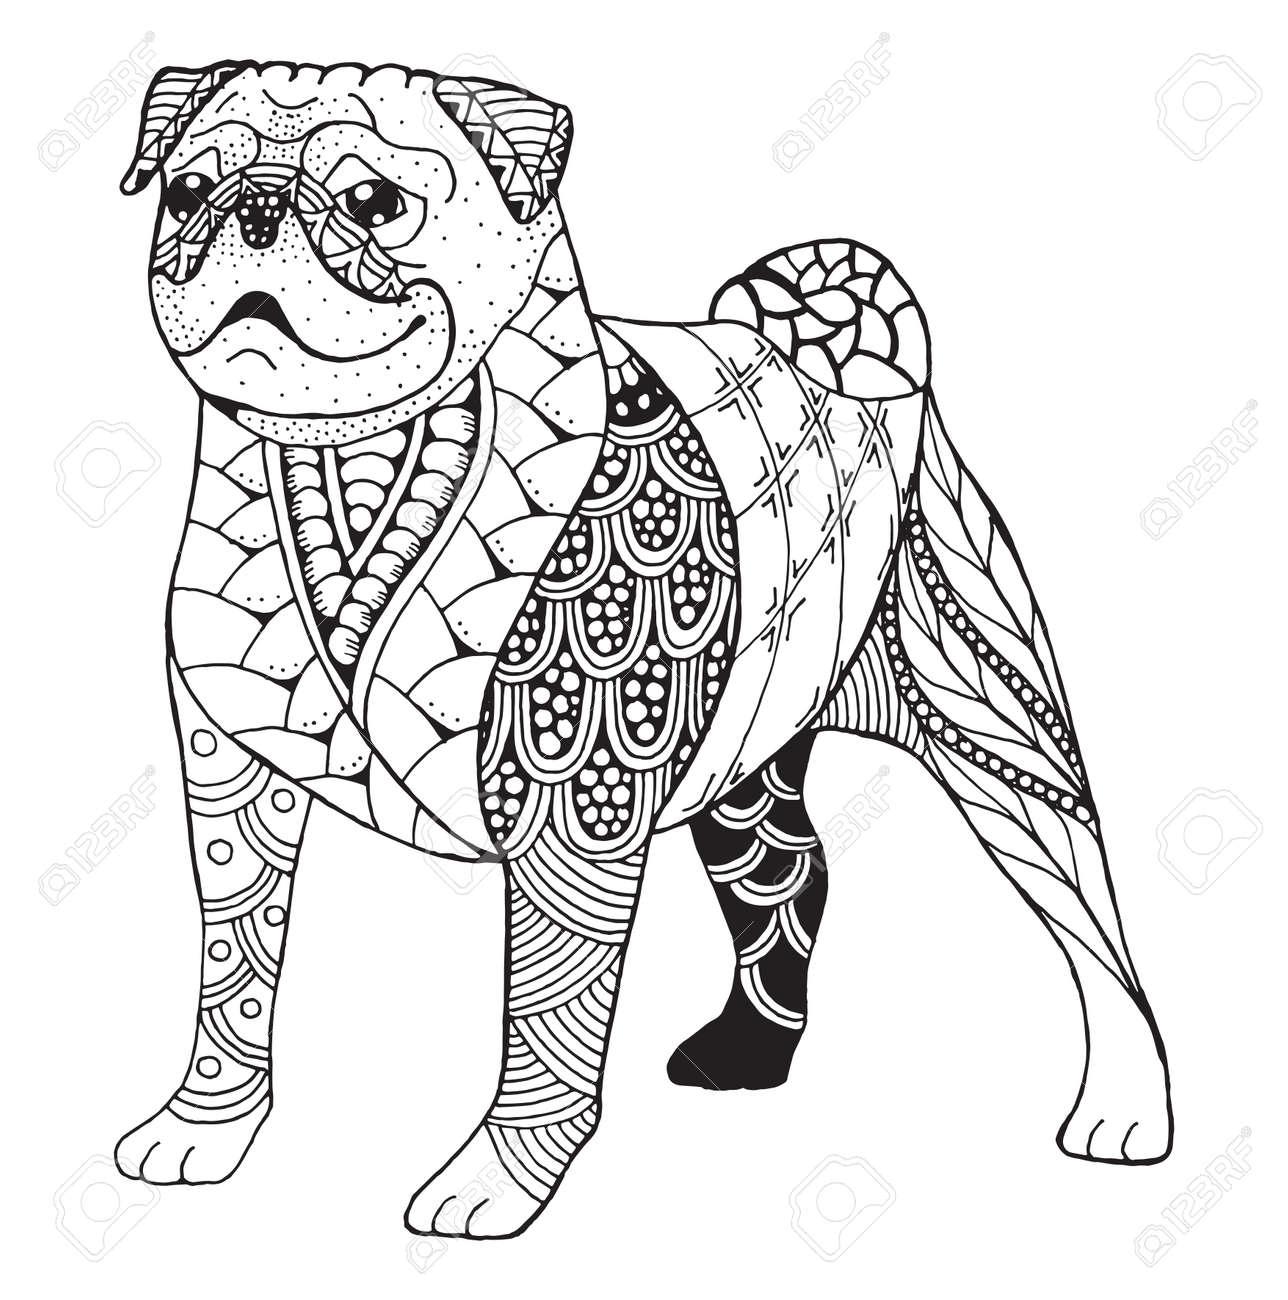 Pug dog zentangle doodle stylized, vector, illustration, freehand